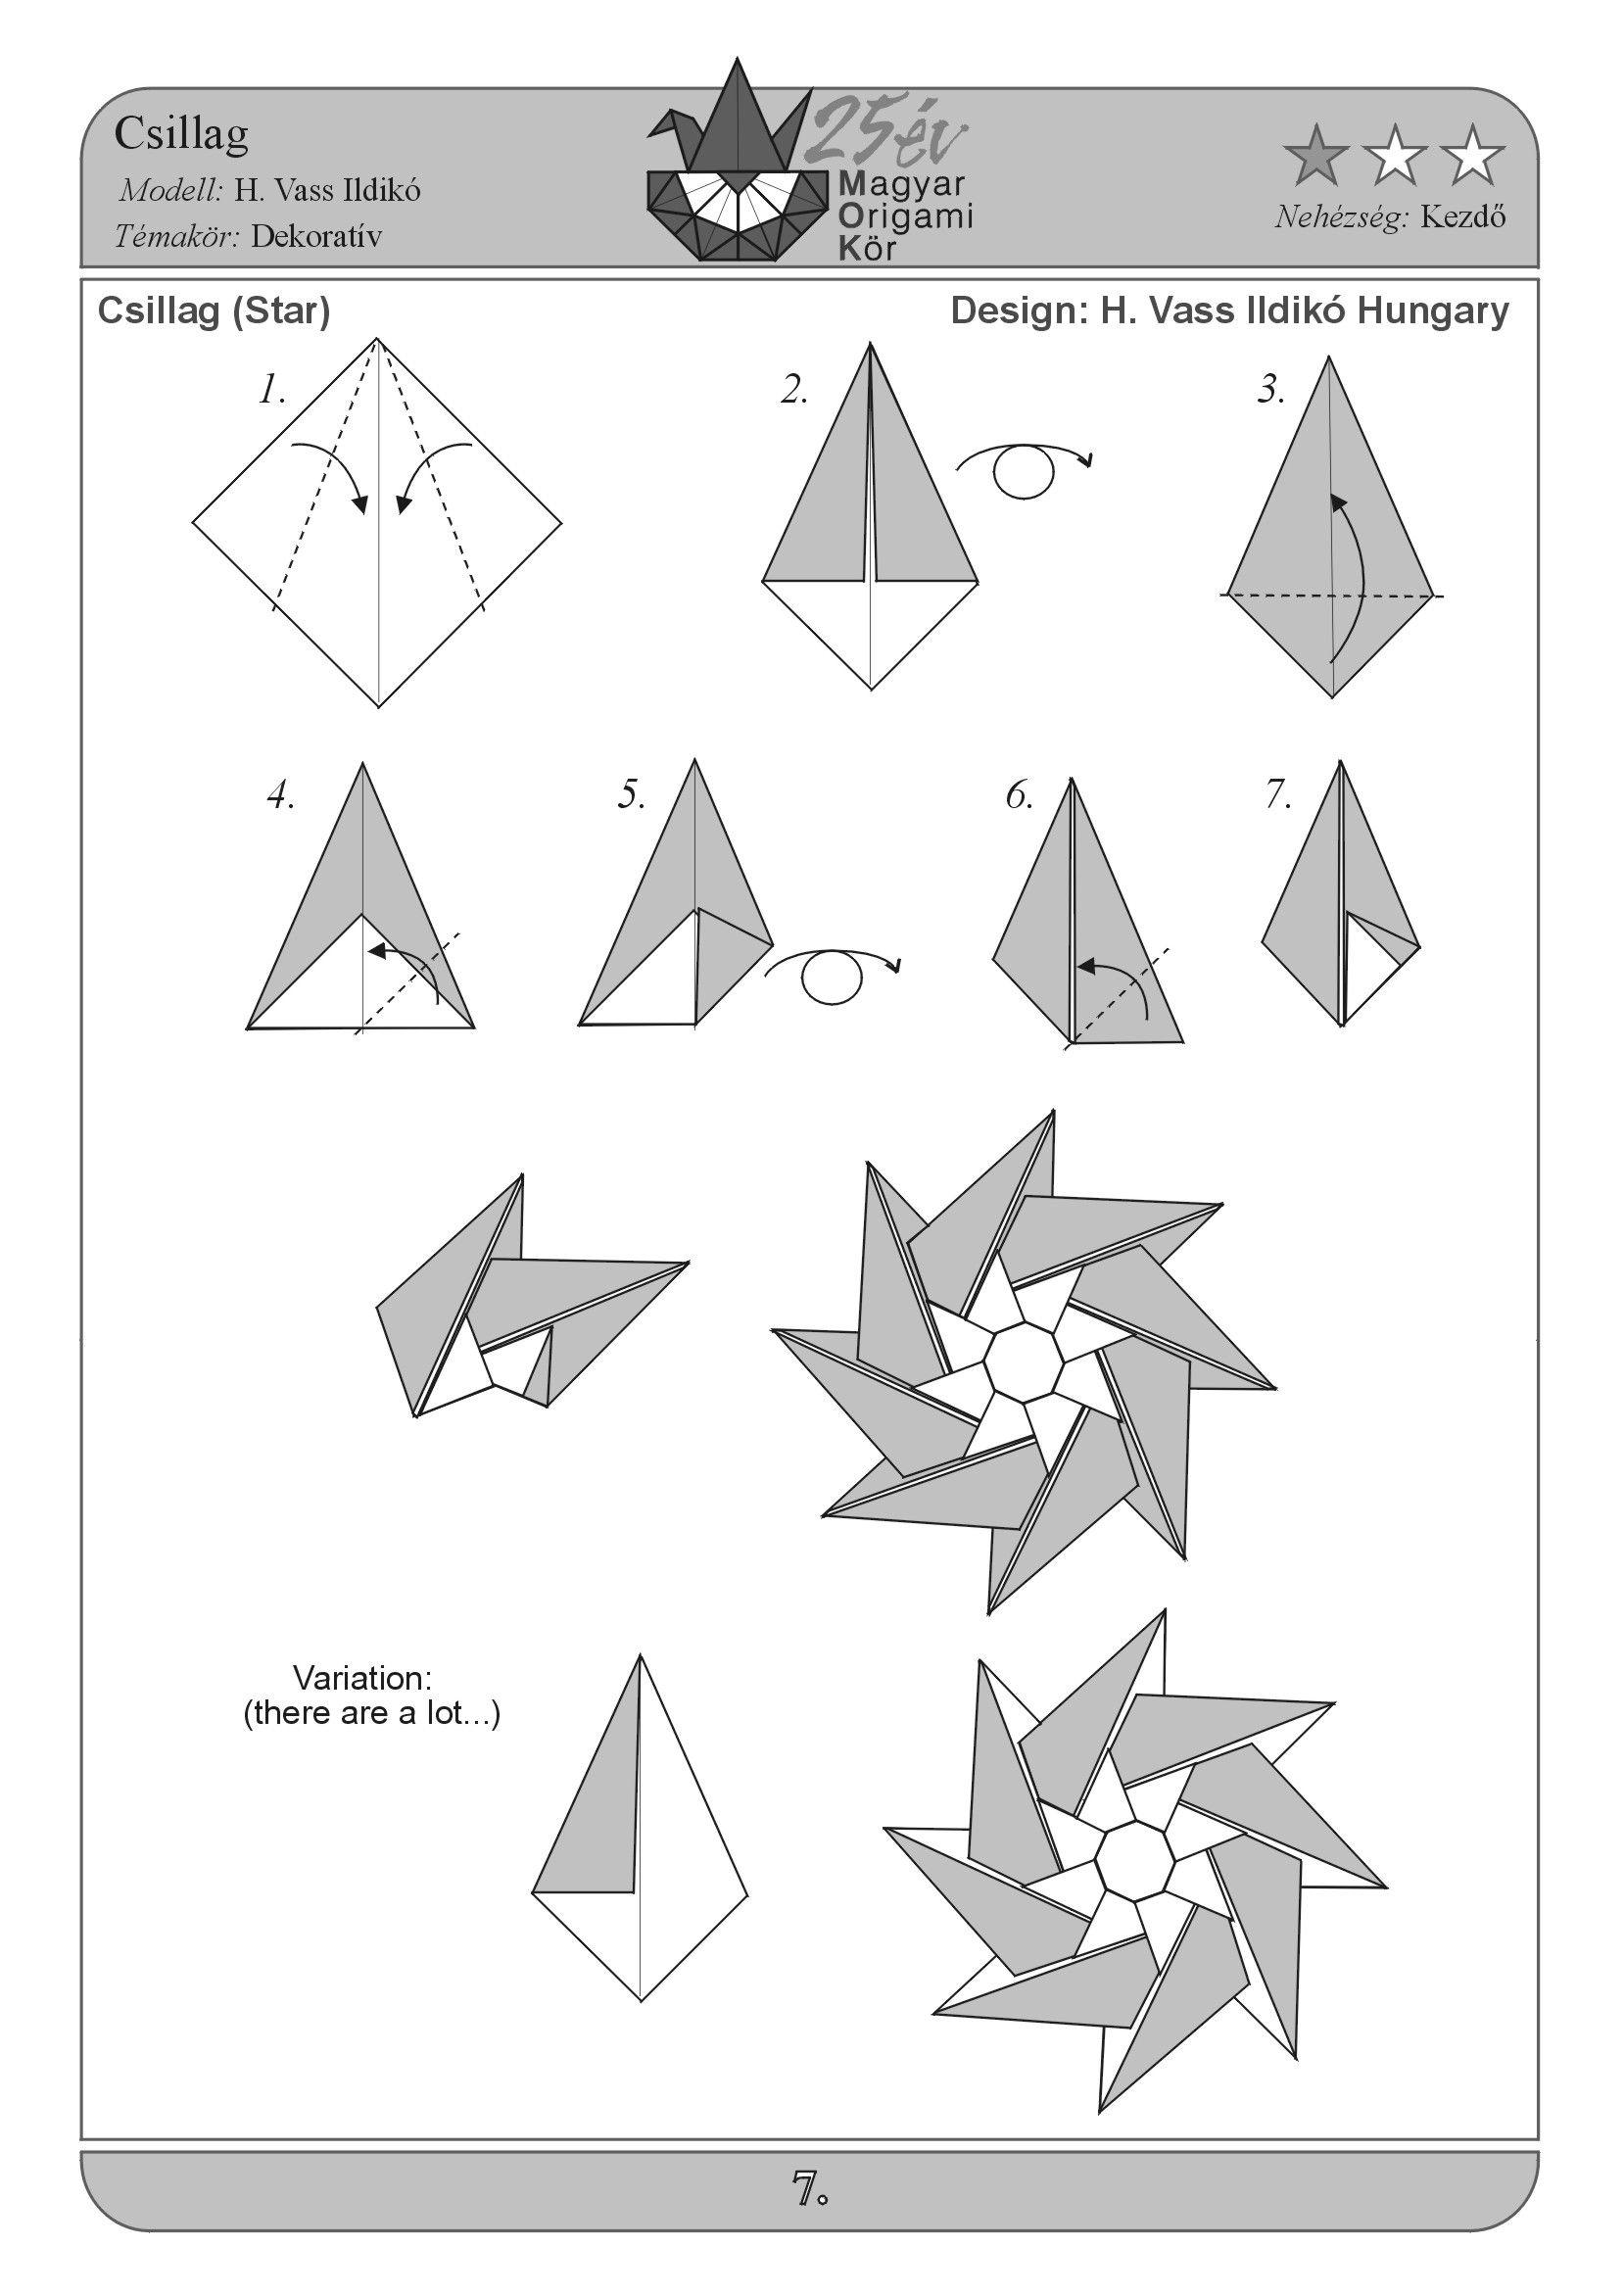 Folding Origami Box Diagram 2004 Jeep Grand Cherokee Laredo Radio Wiring Papírvarázslat Képgaléria Diagrams Rajzok